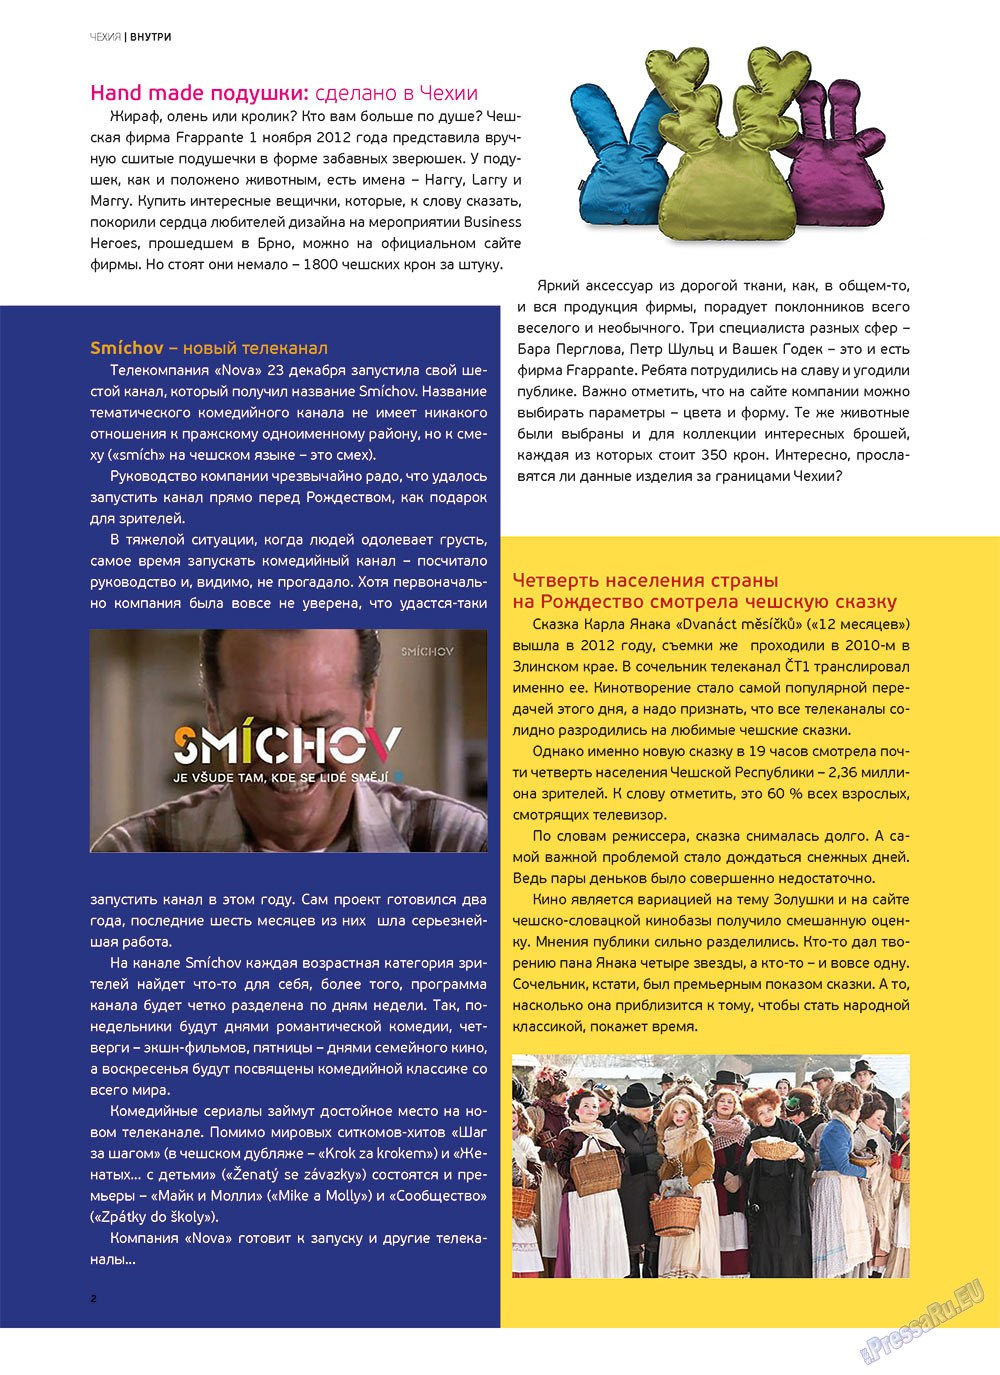 Артек (журнал). 2012 год, номер 6, стр. 4